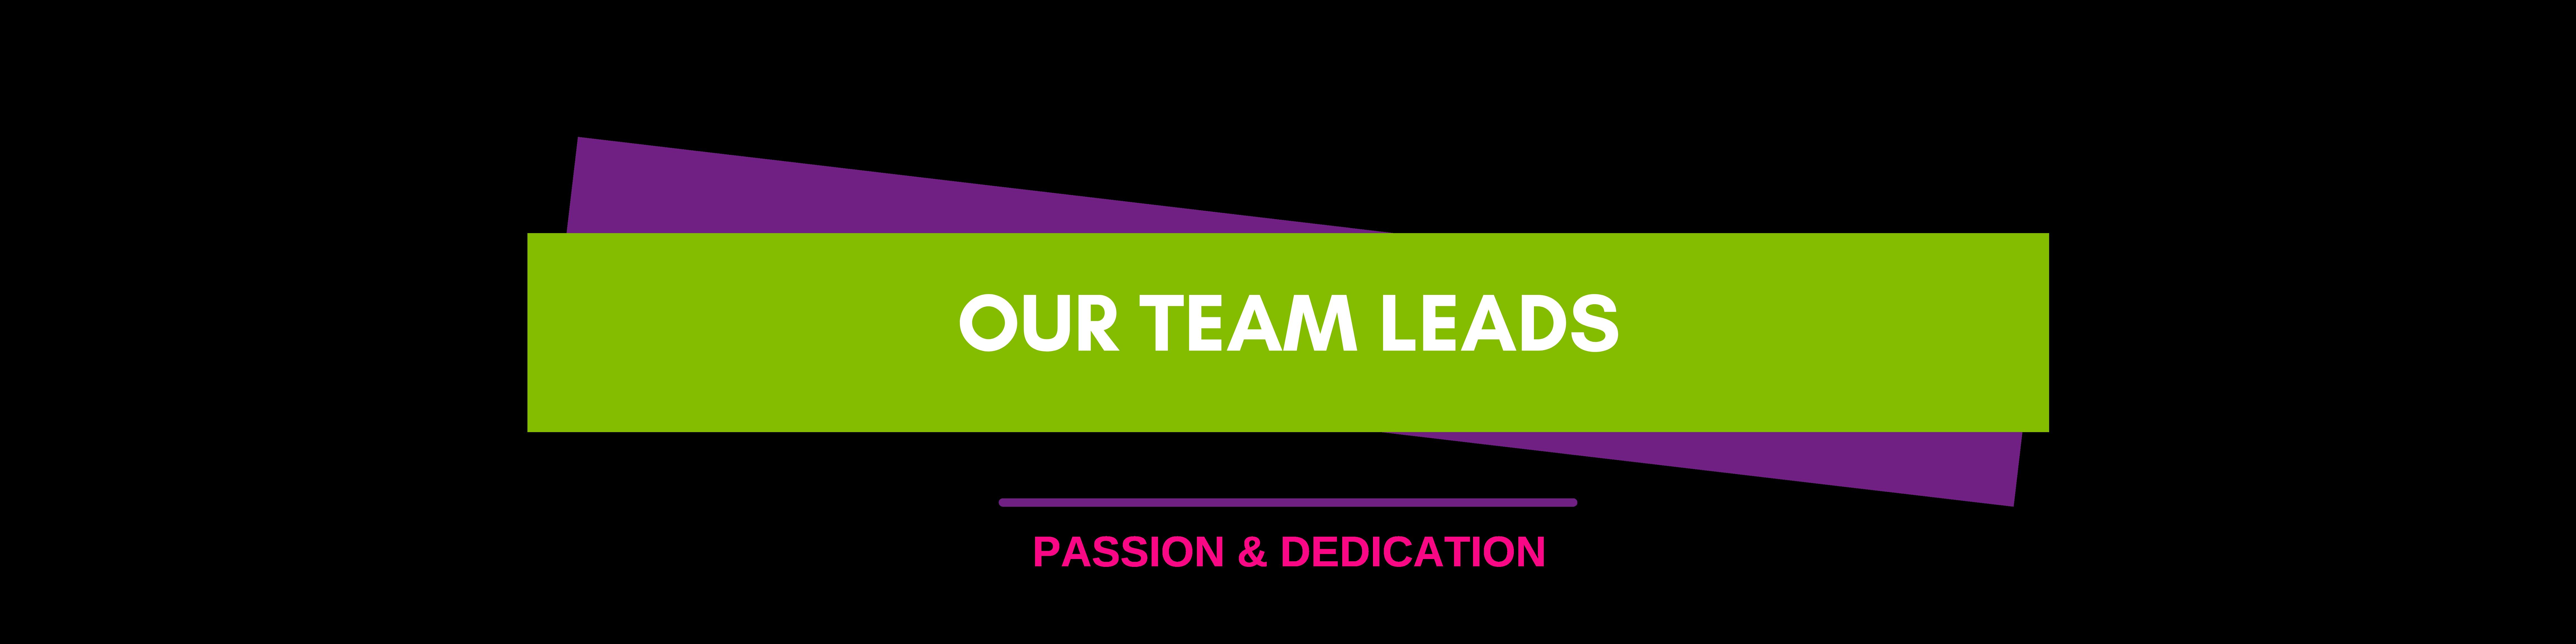 Dream-Team-Team-Leaders-Title-Banner-Assuaged